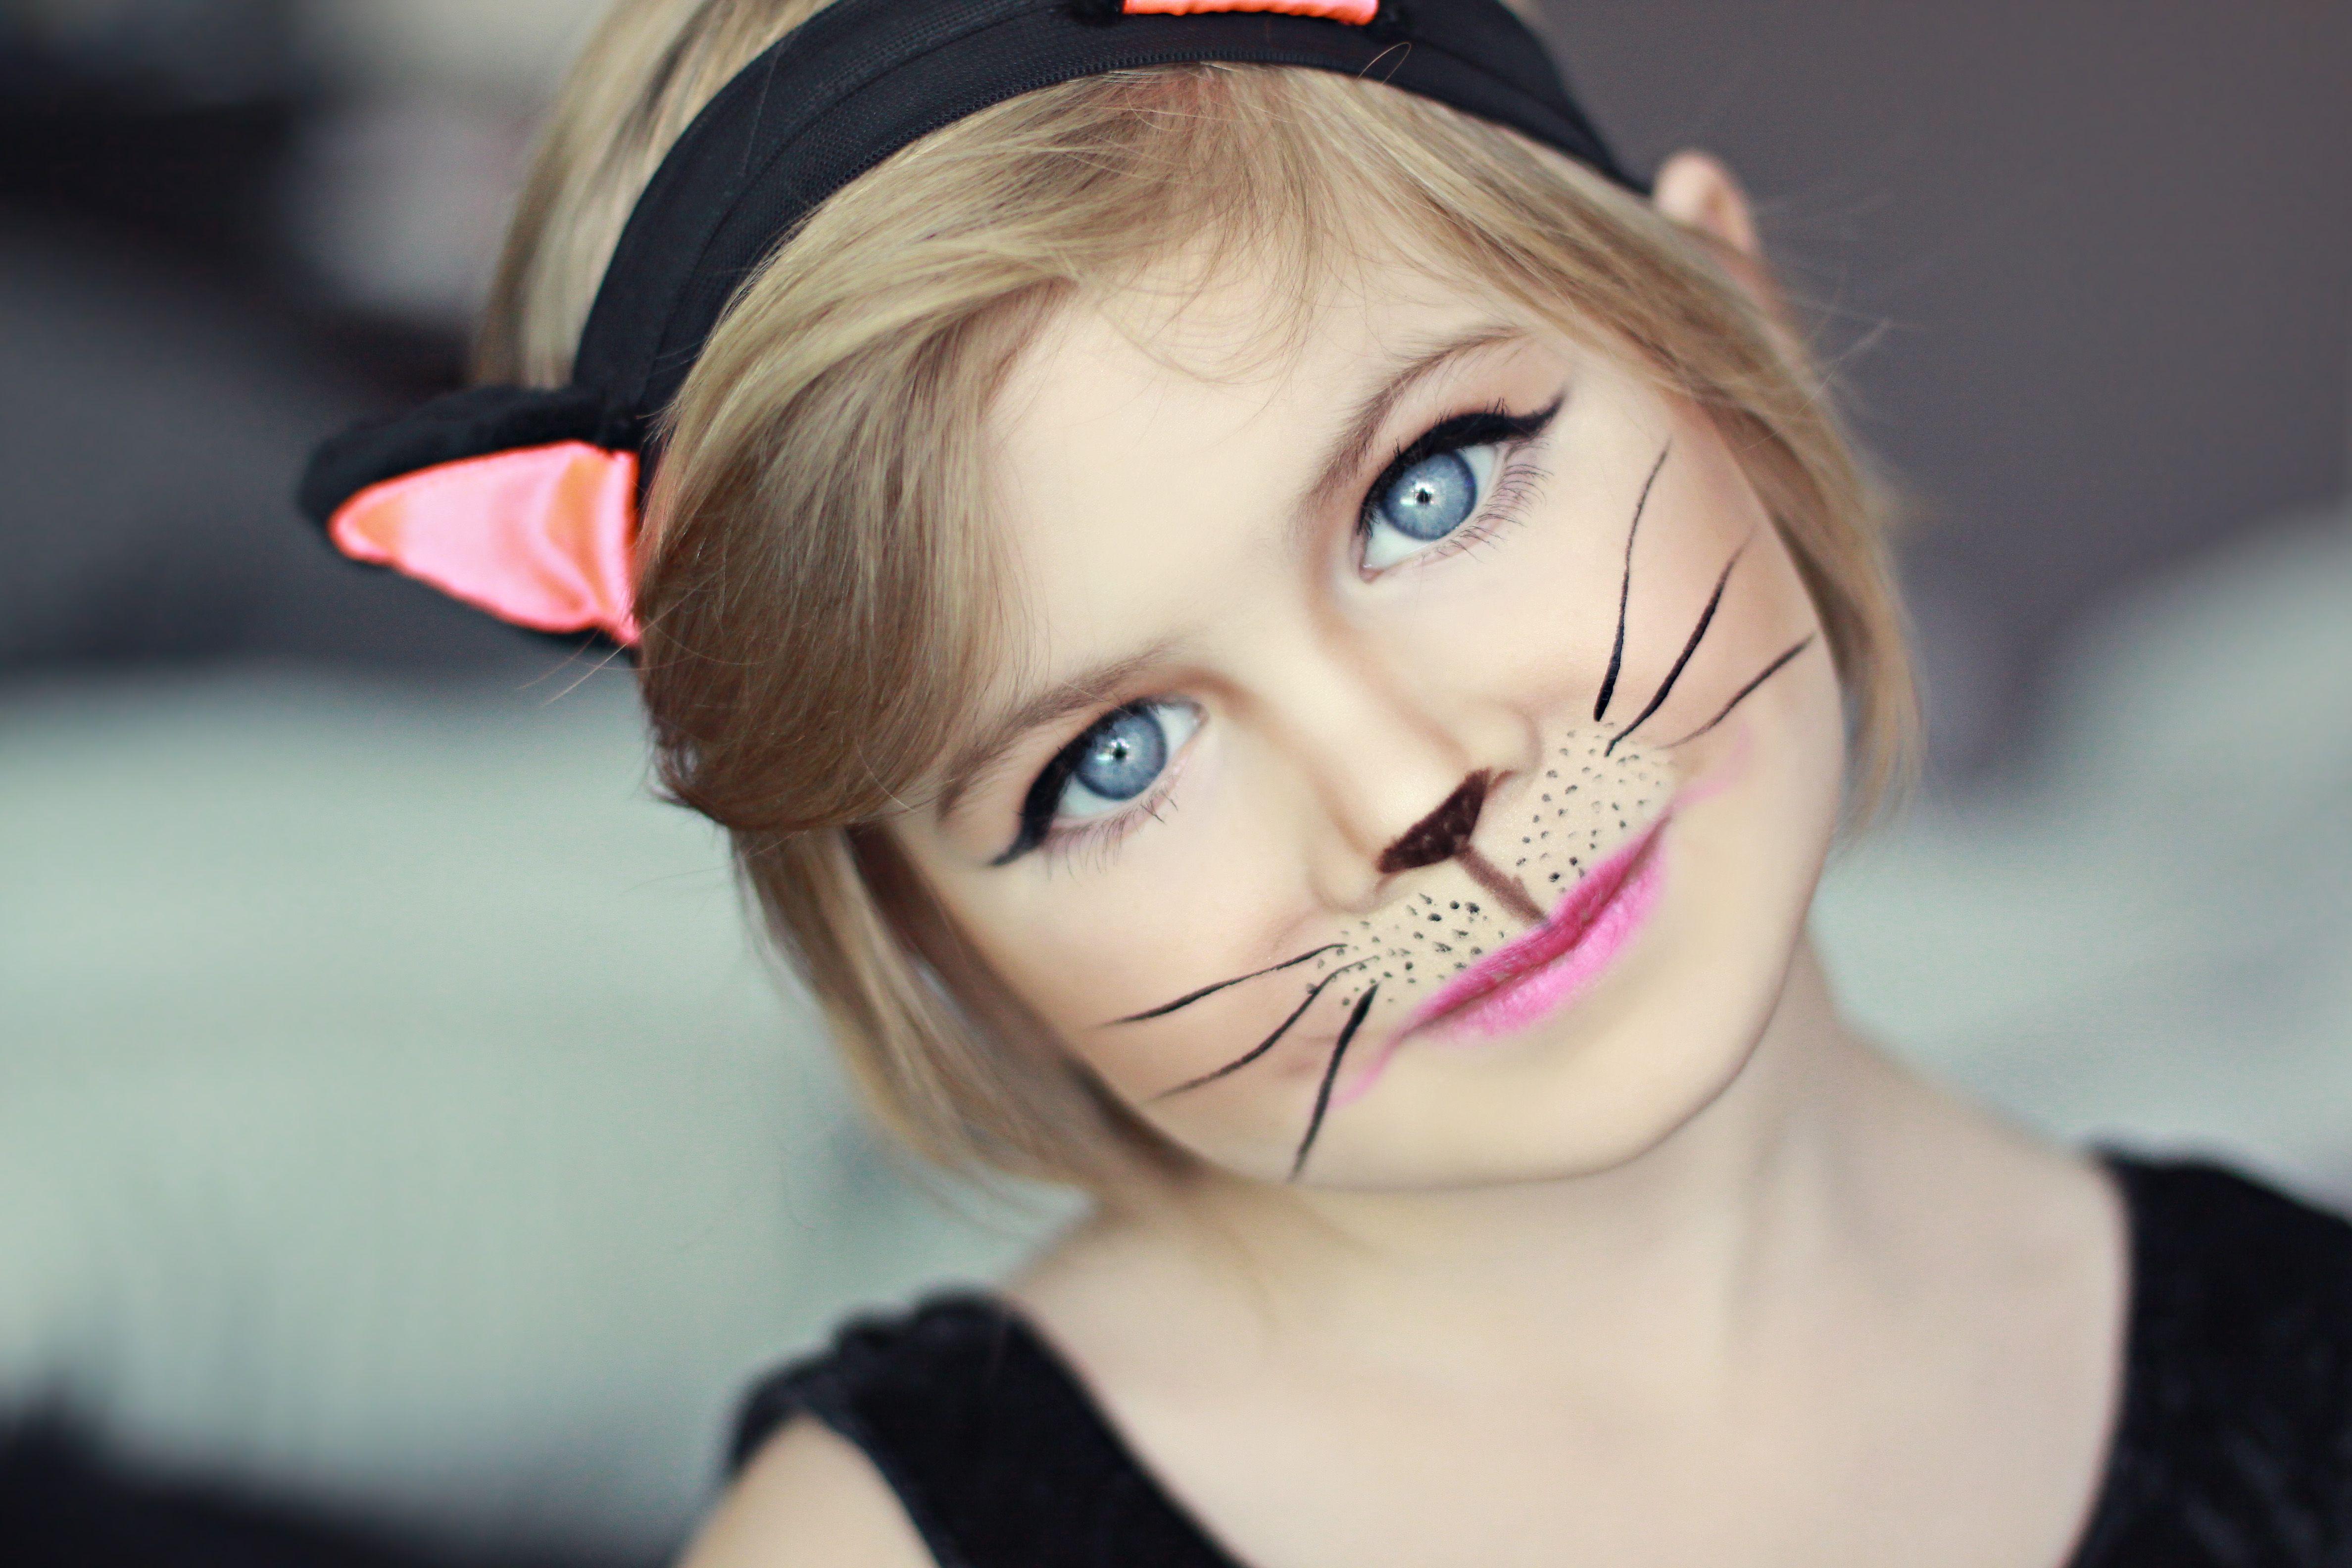 Cat Makeup Kid Costume Www Sunkissedandmadeup Com Halloween Makeup For Kids Kitty Face Paint Cat Makeup For Kids